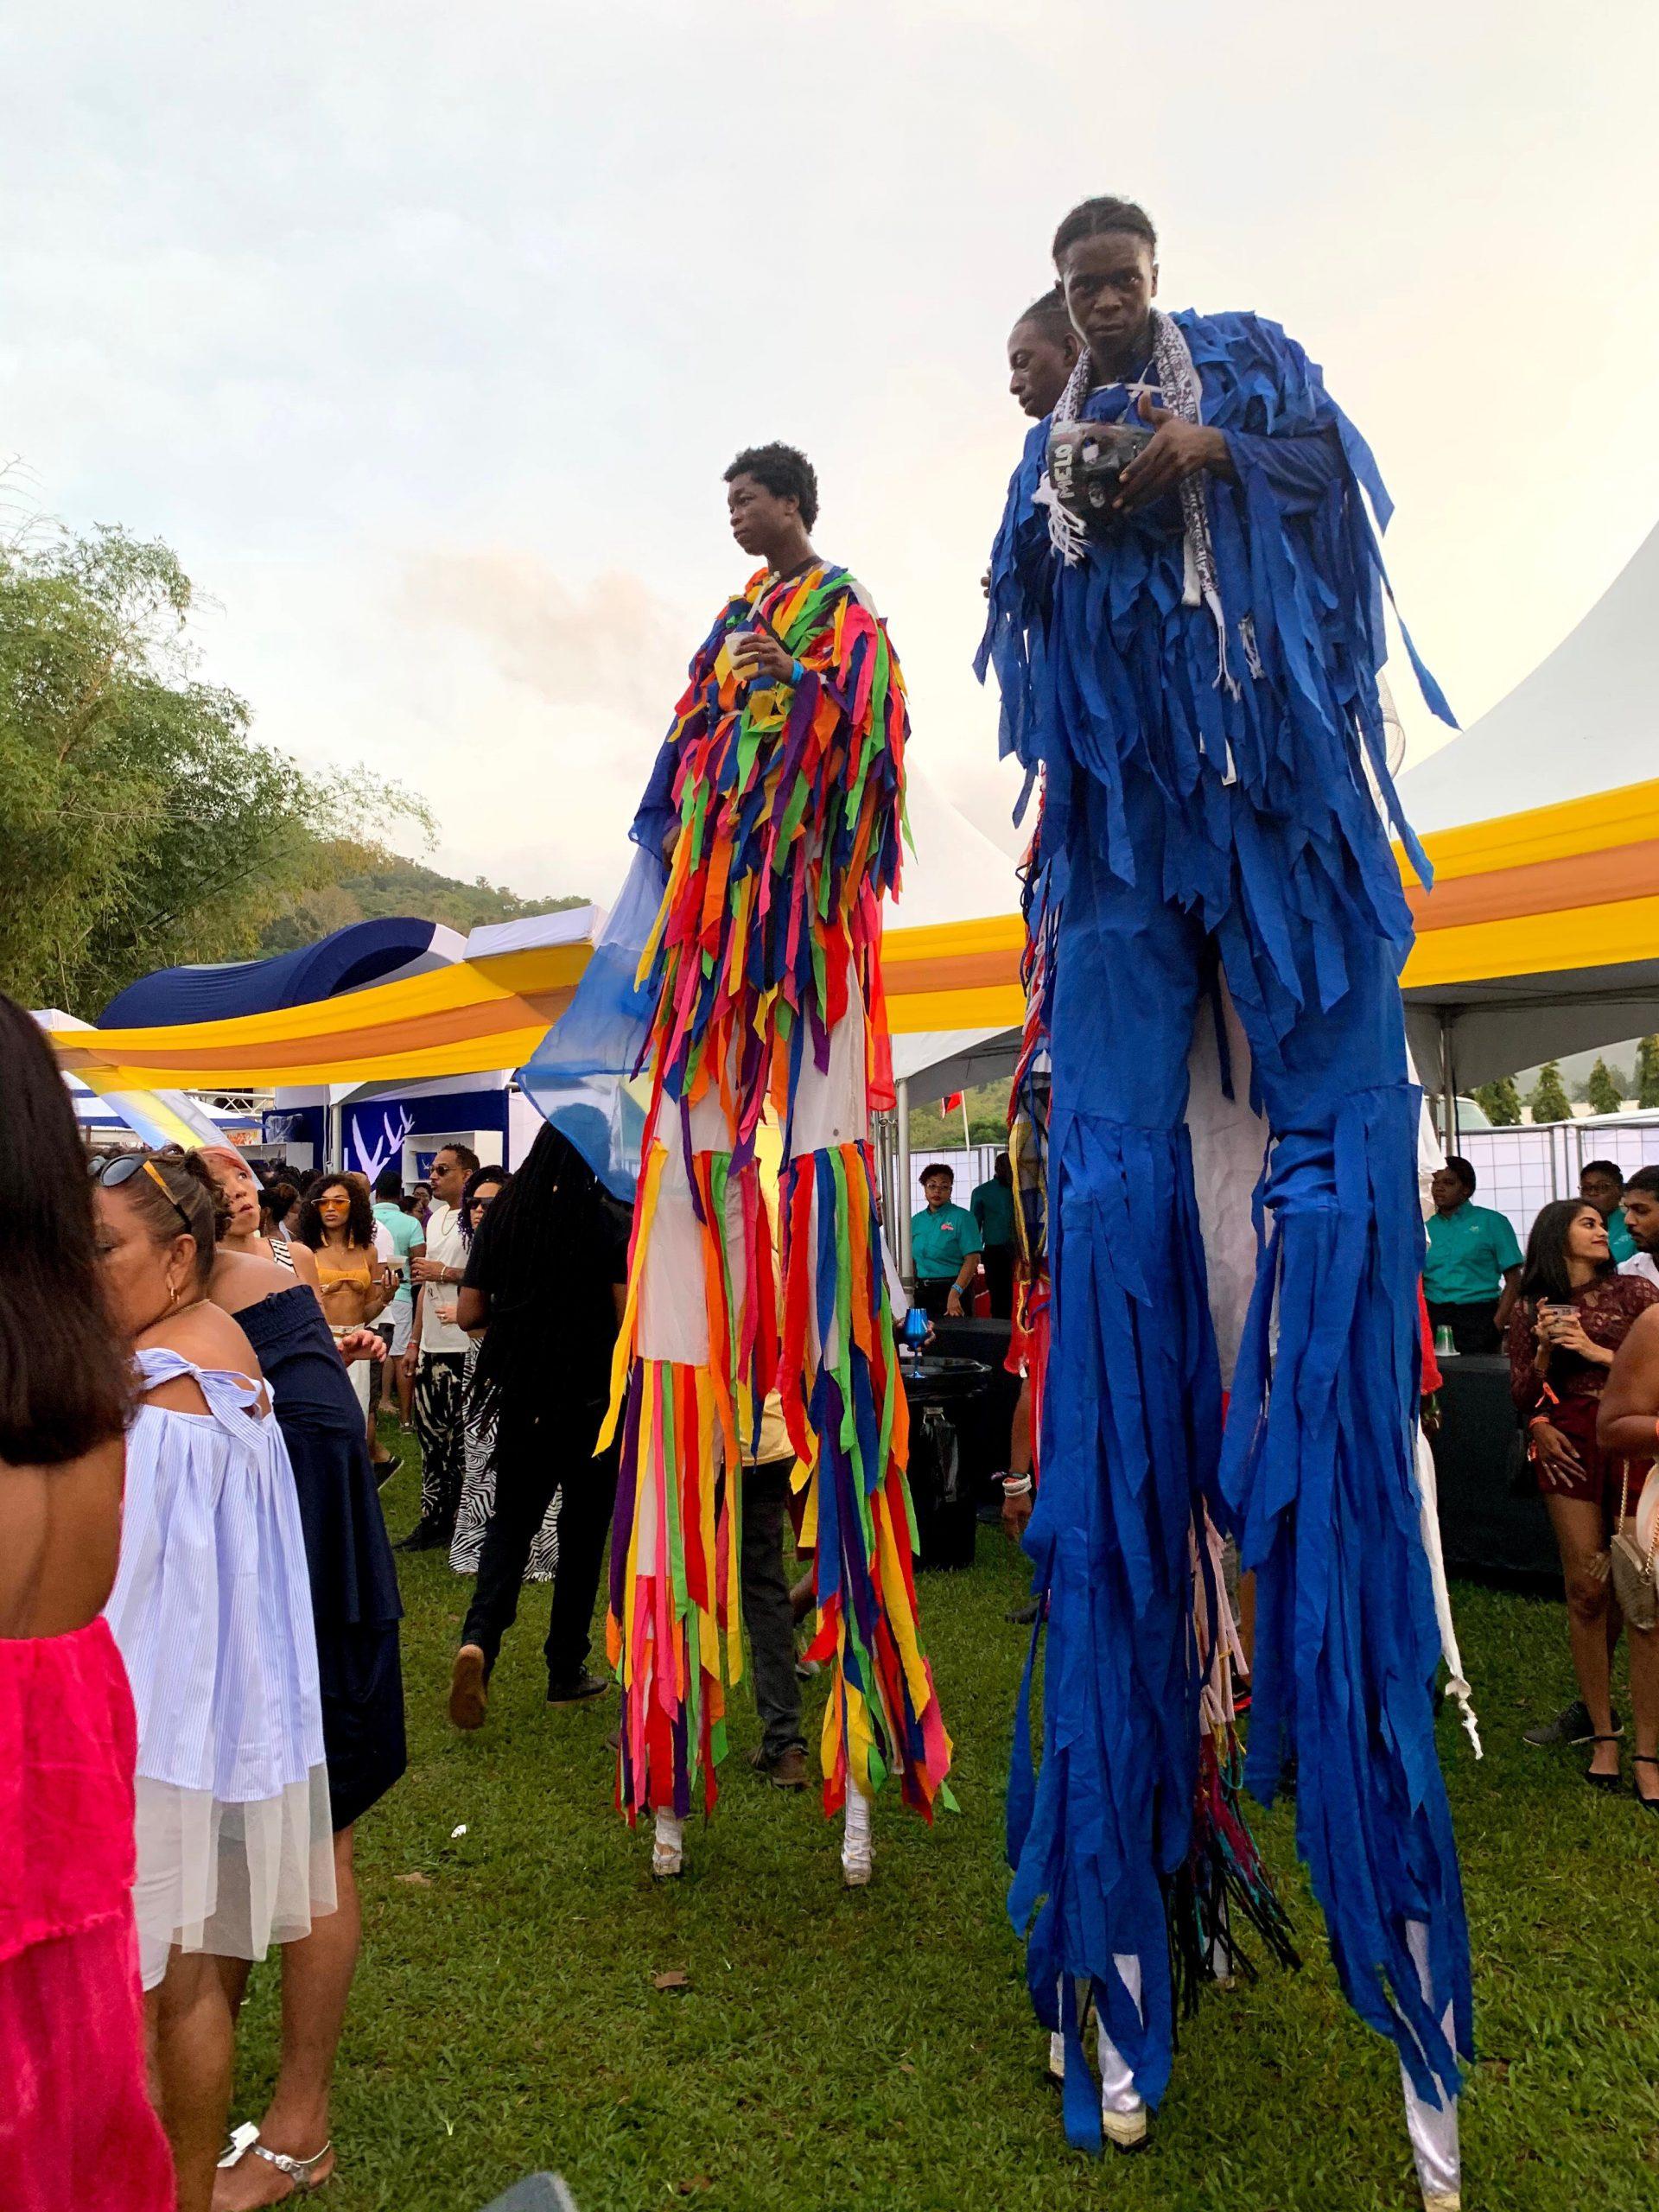 moko jumbie trinidad and tobago carnival 2020 vale vibe fete